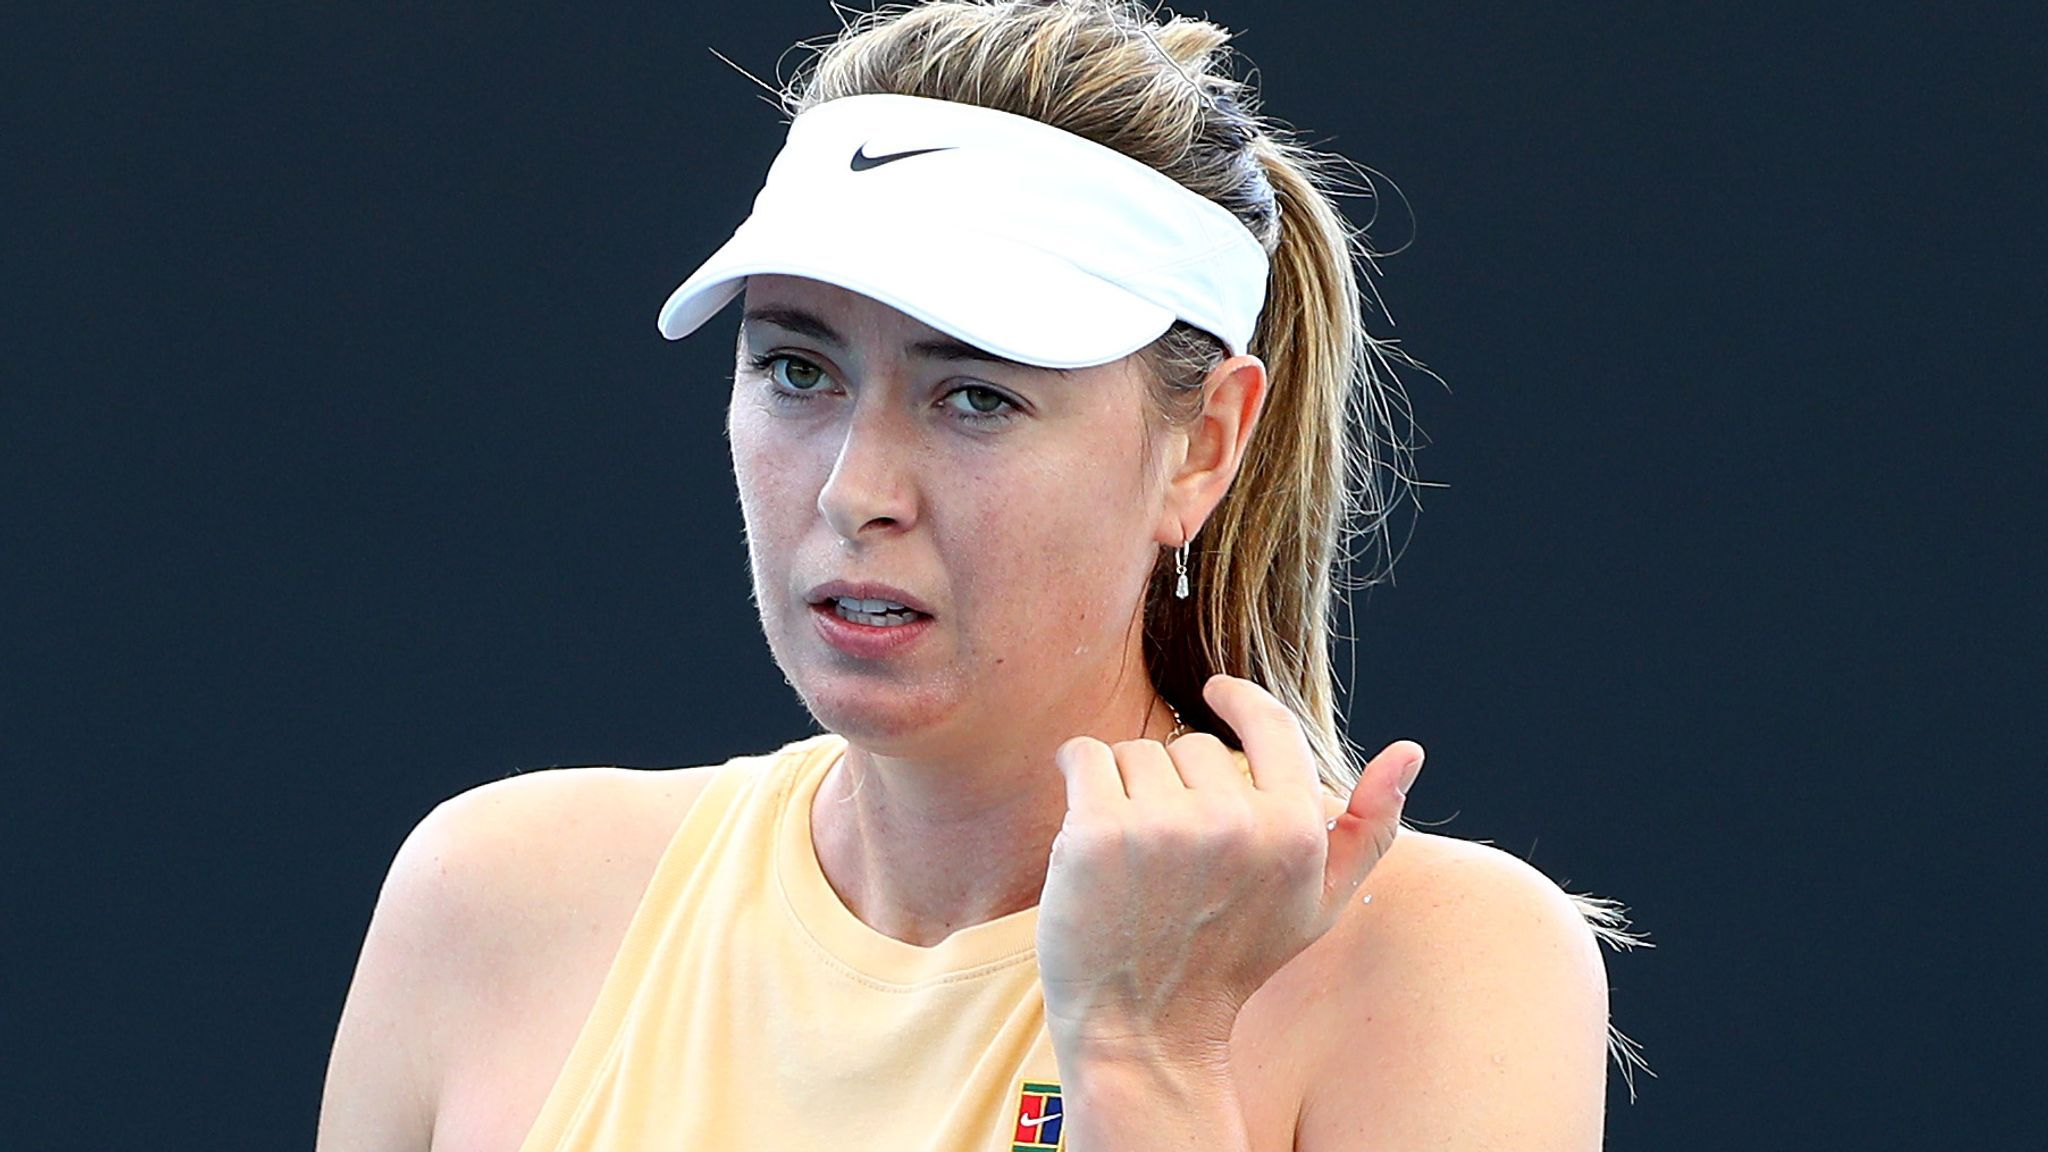 Top 20 Most Beautiful Female Tennis Players List 2020 Hottest Tennis Players In 2020 Tennis Players Female Maria Sharapova Tennis Players